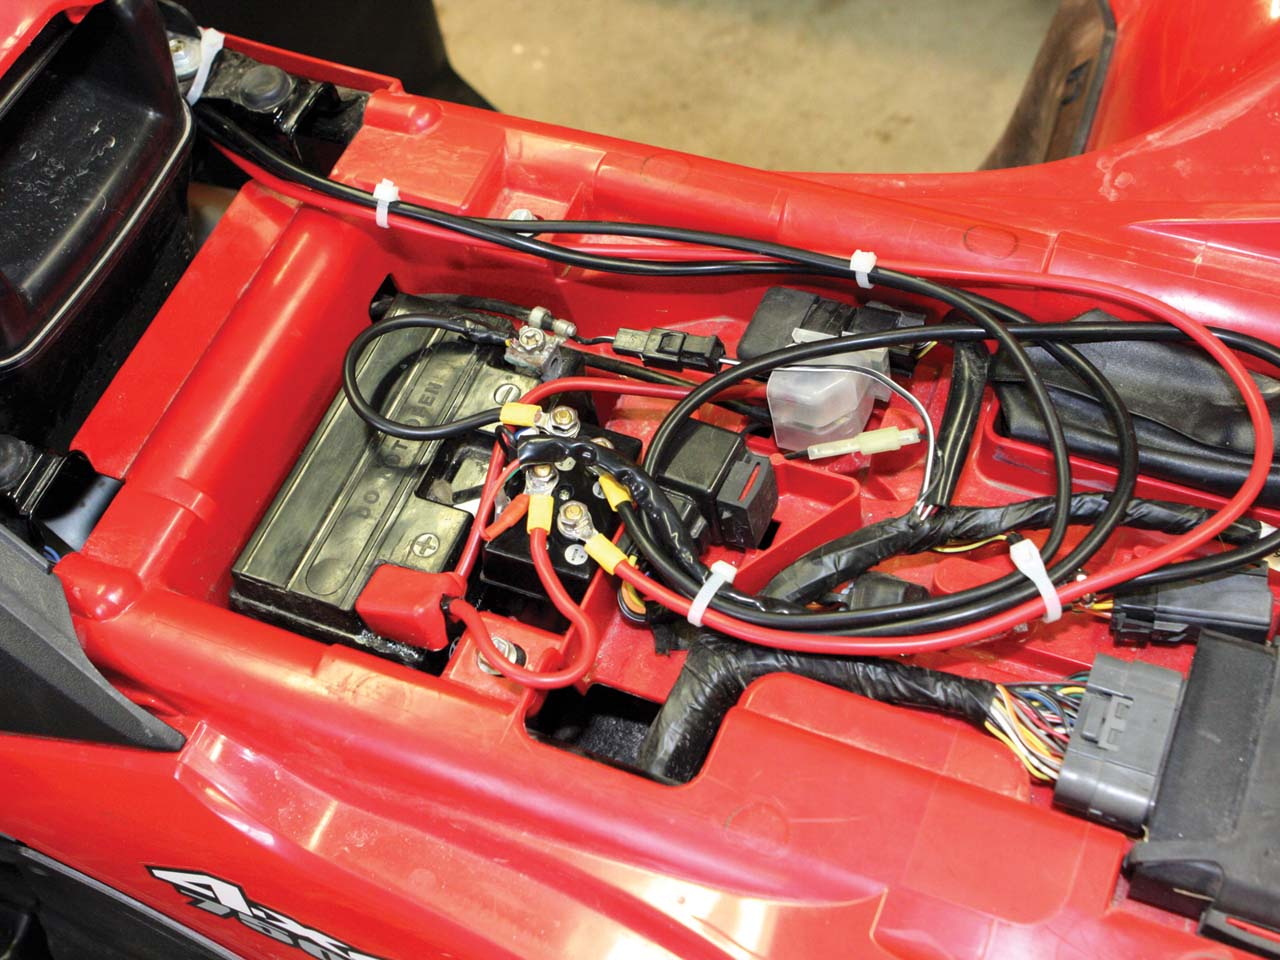 Kawasaki Bayou Battery Wiring New Product Test Snow Eagle Atv Illustrated